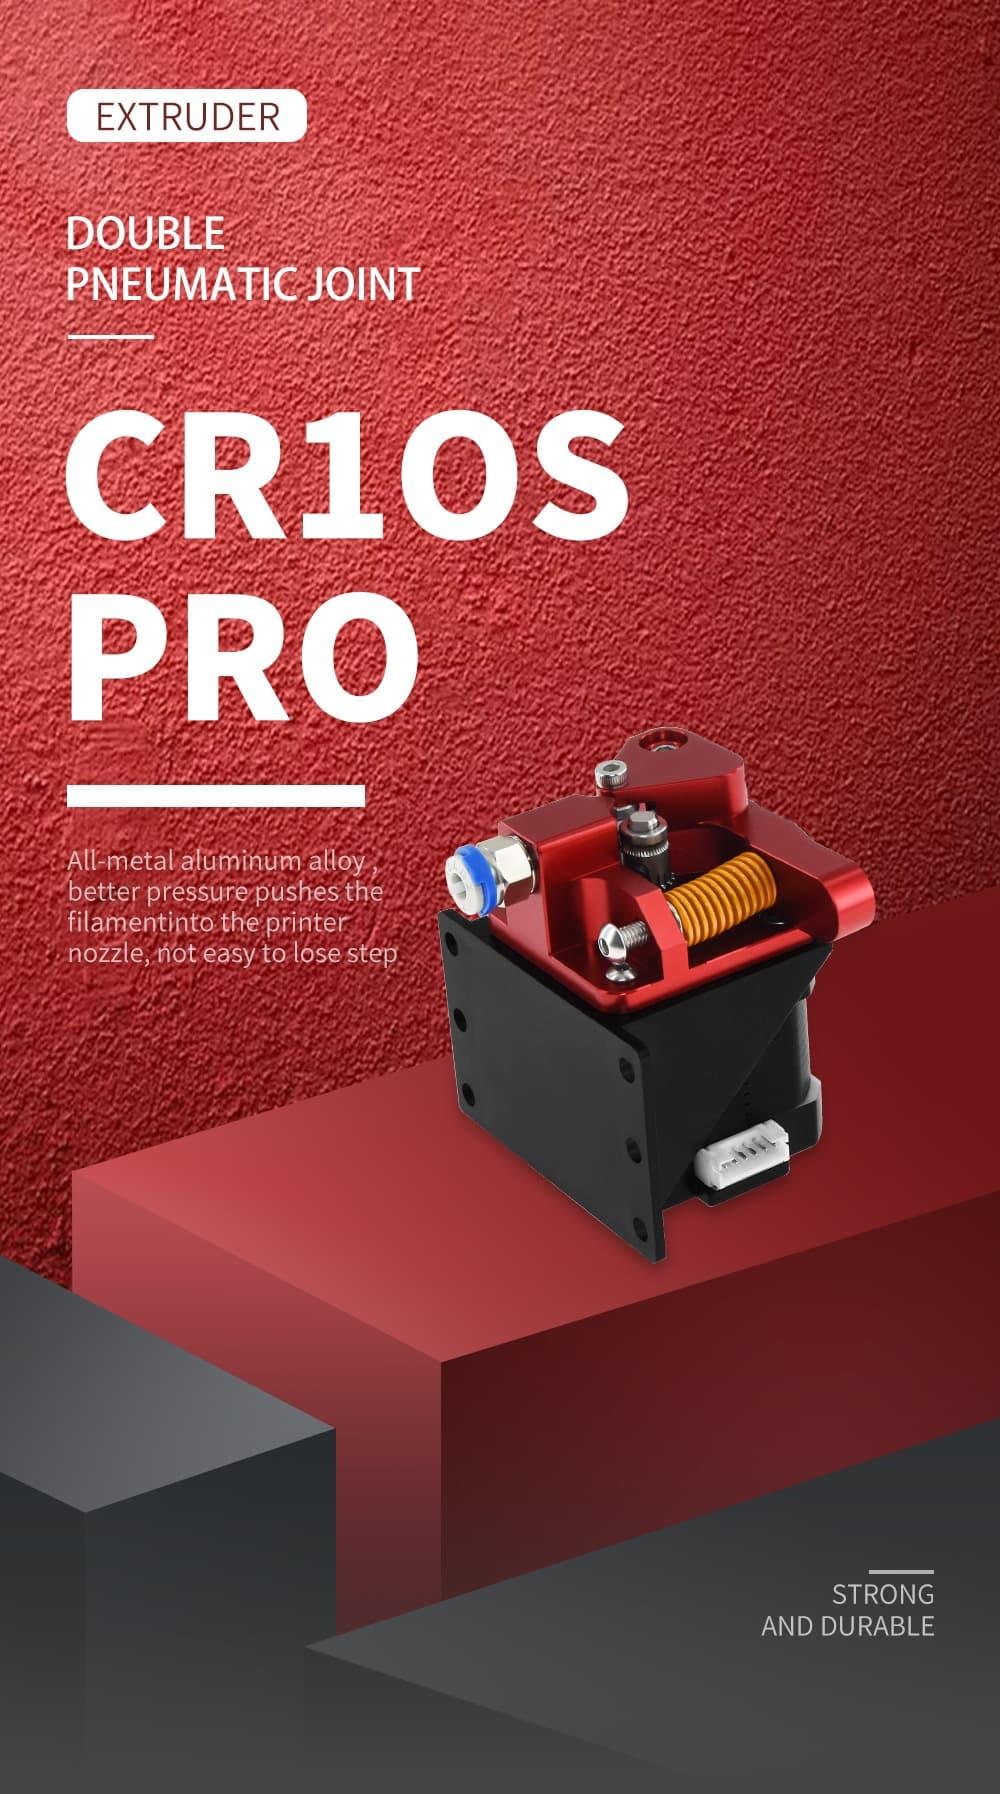 CR10 EXTRUDER 1